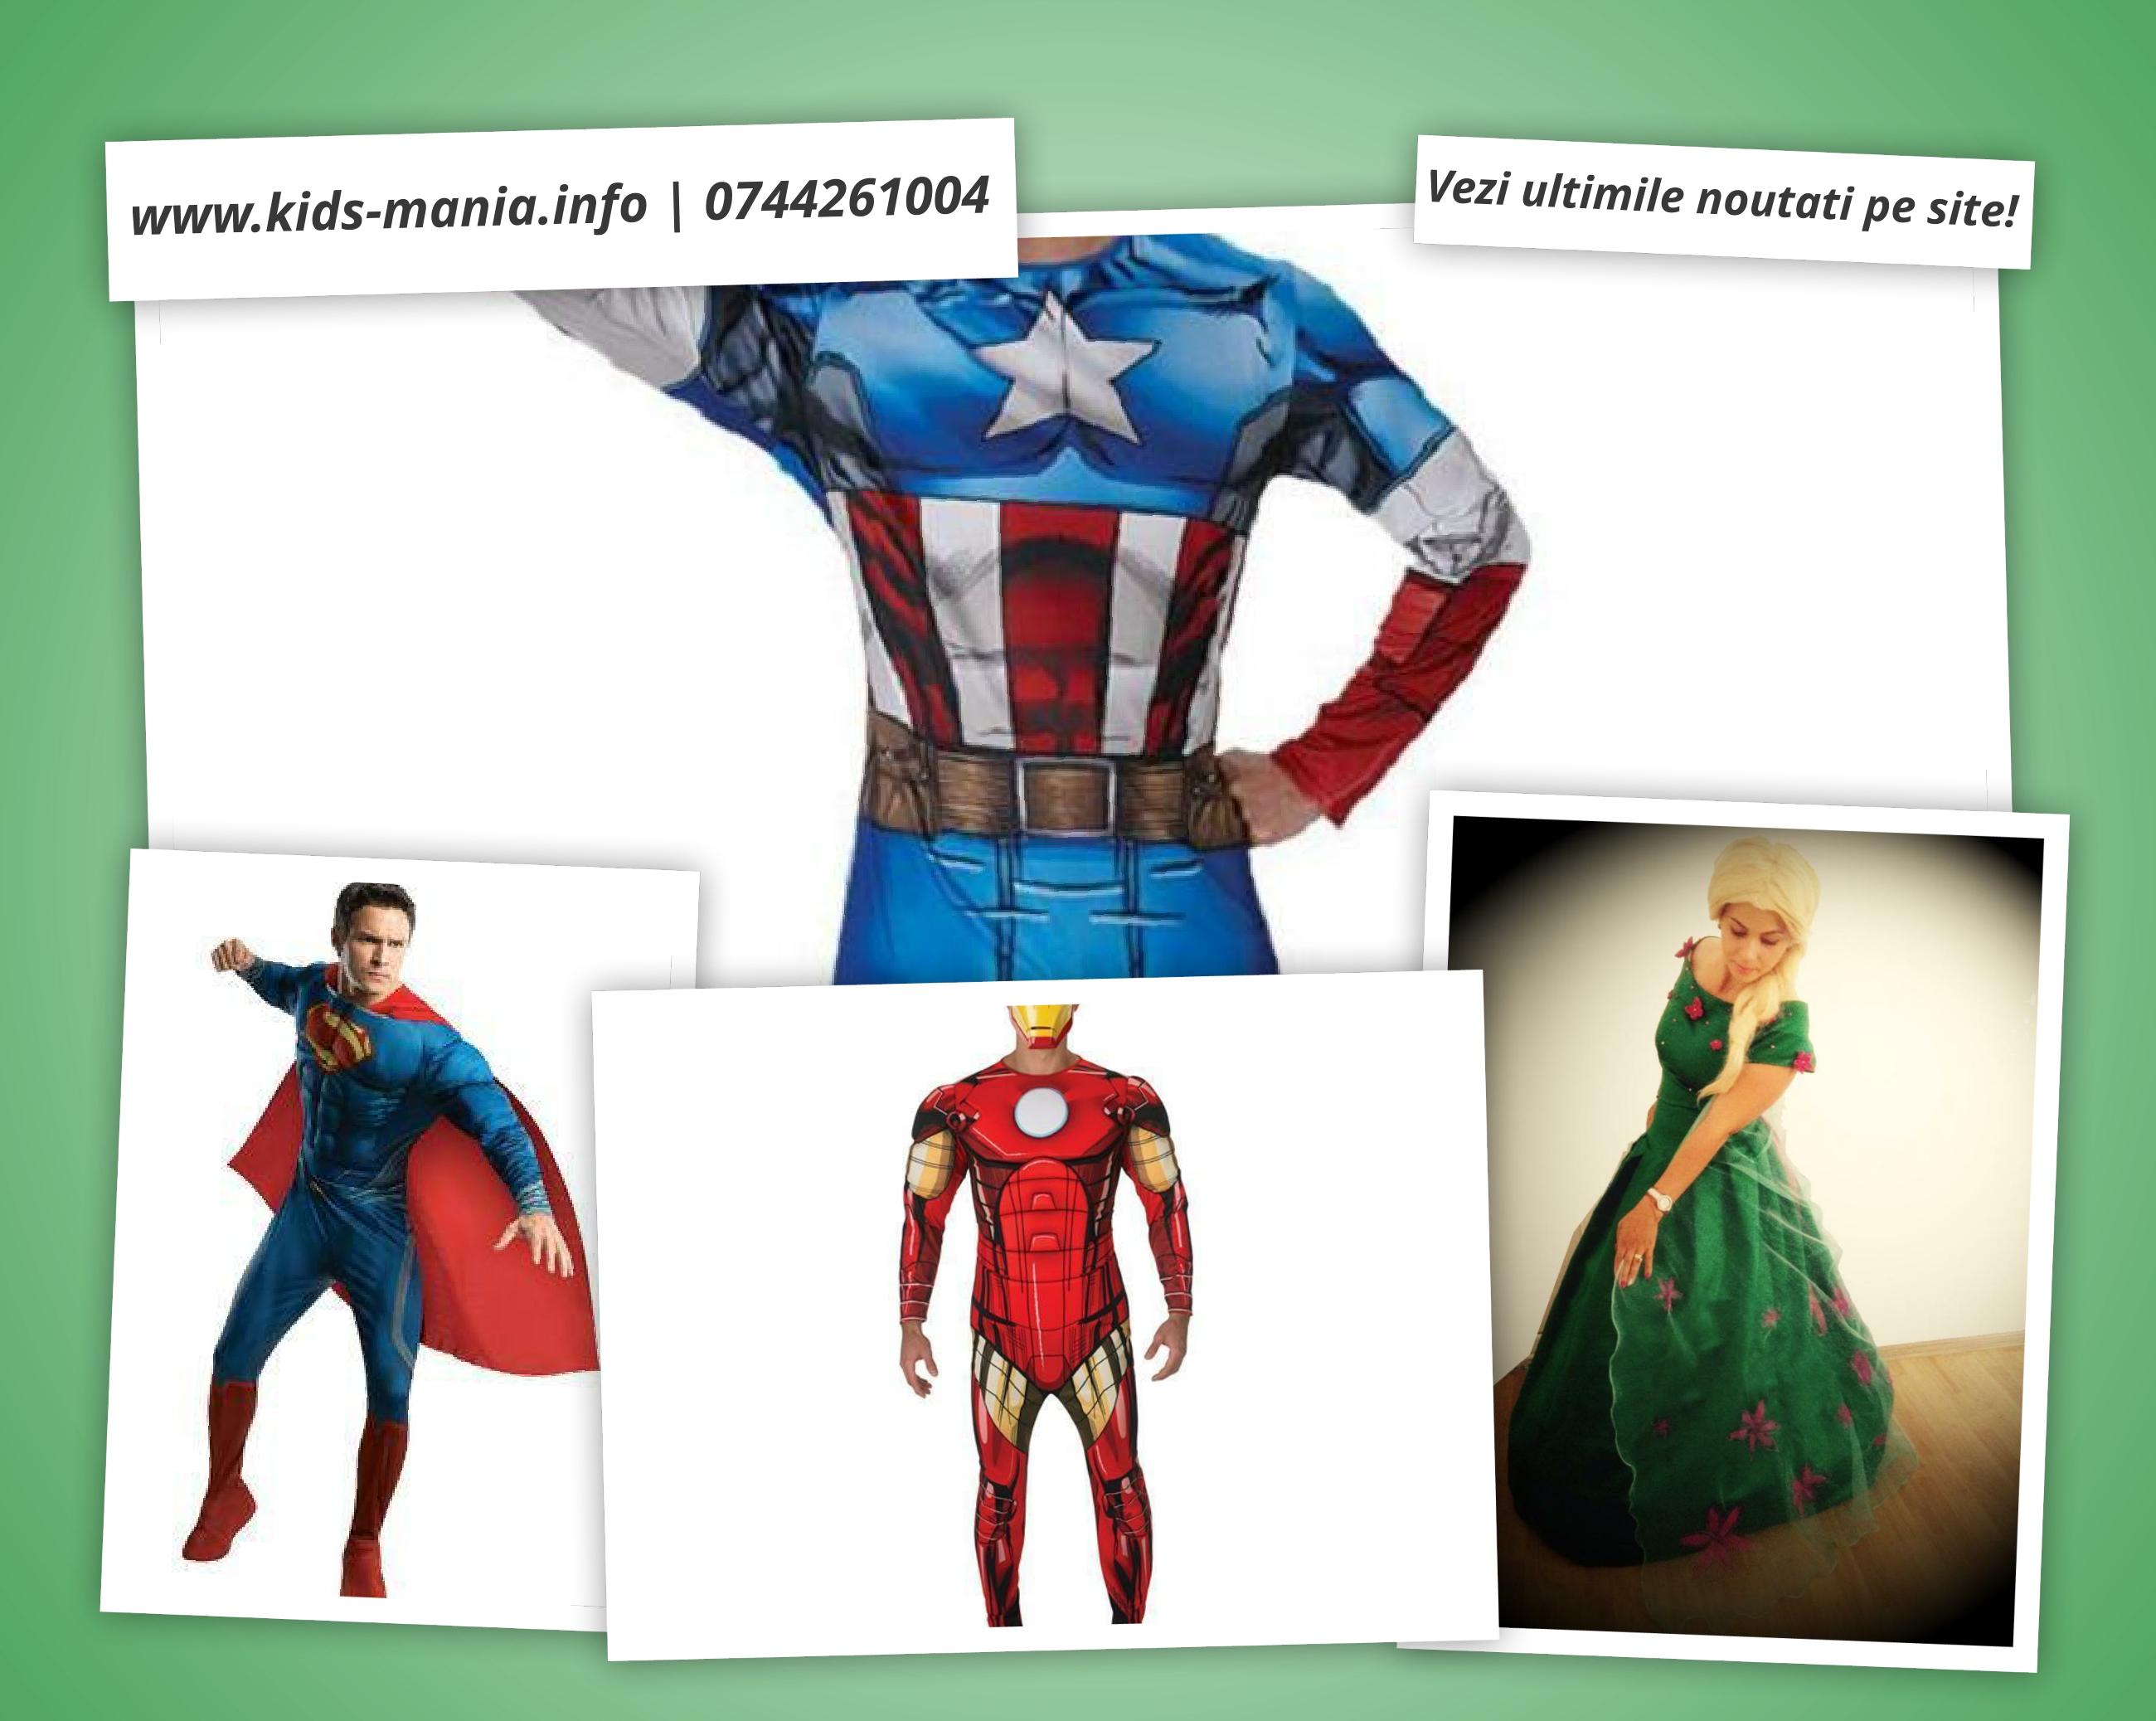 kids mania iasi noile costumatii ironman, superman, capitan america si Elsa fever